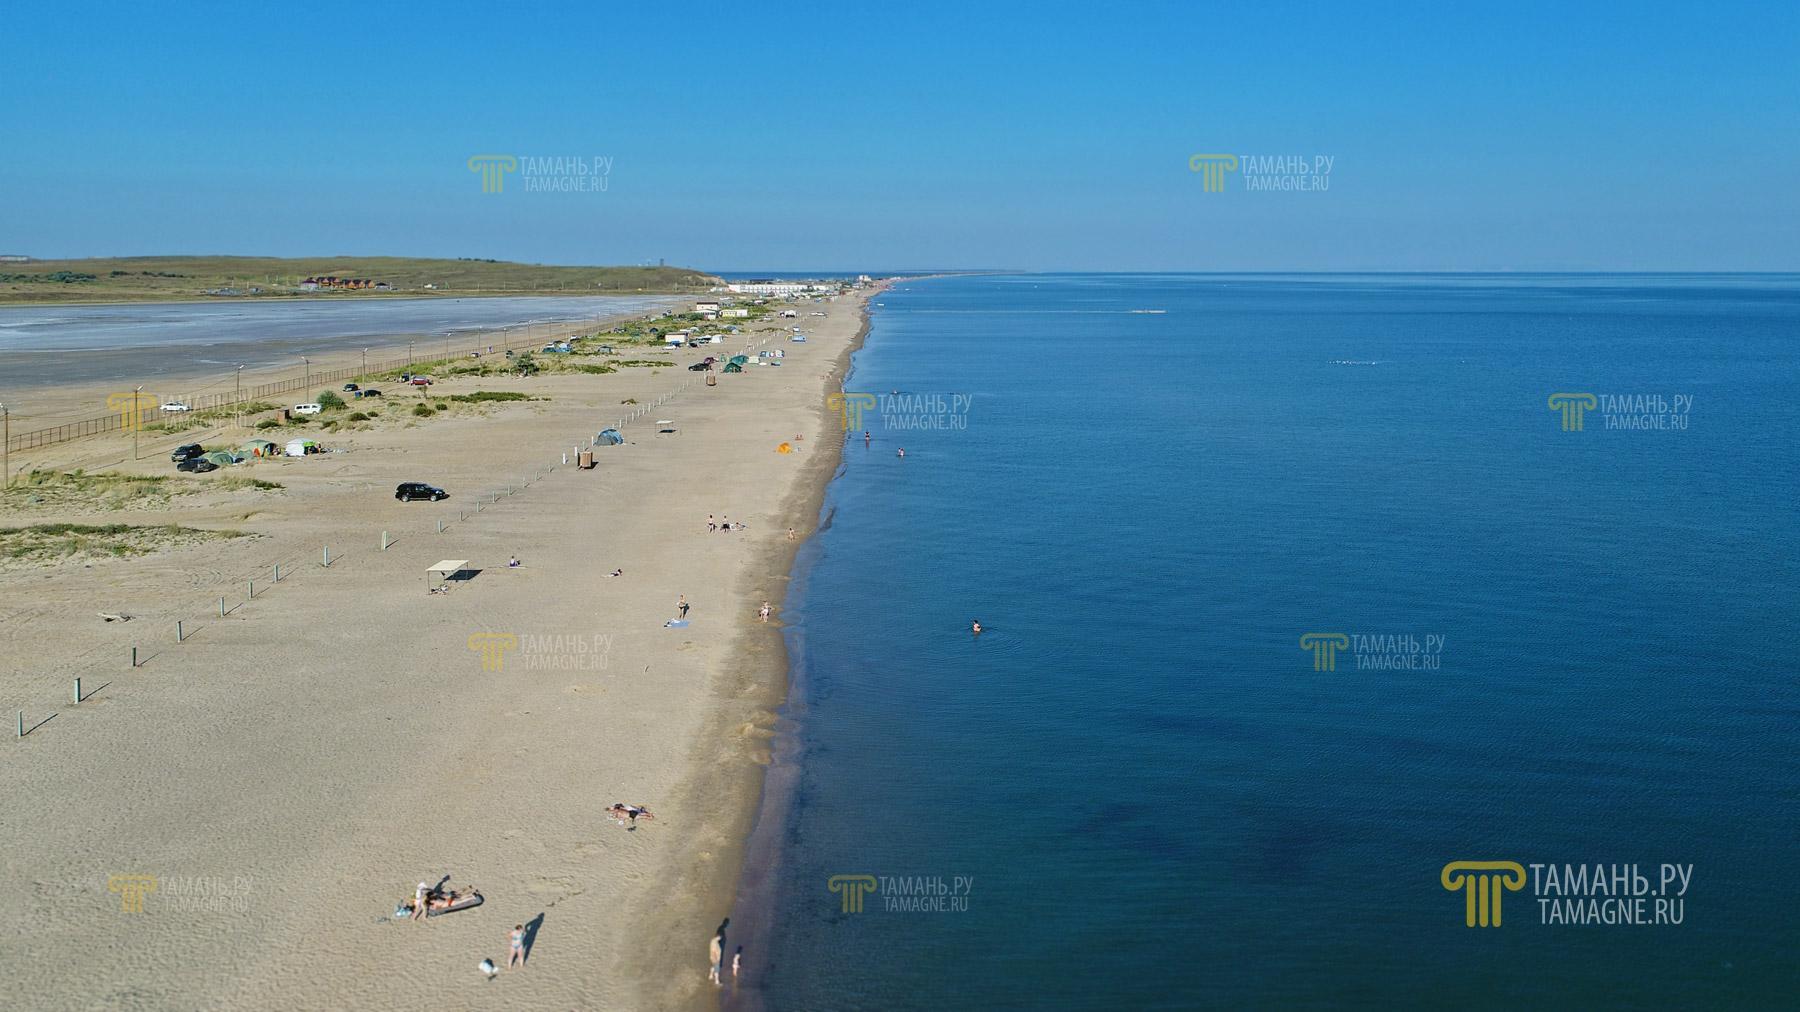 Поселок веселовка пляж фото